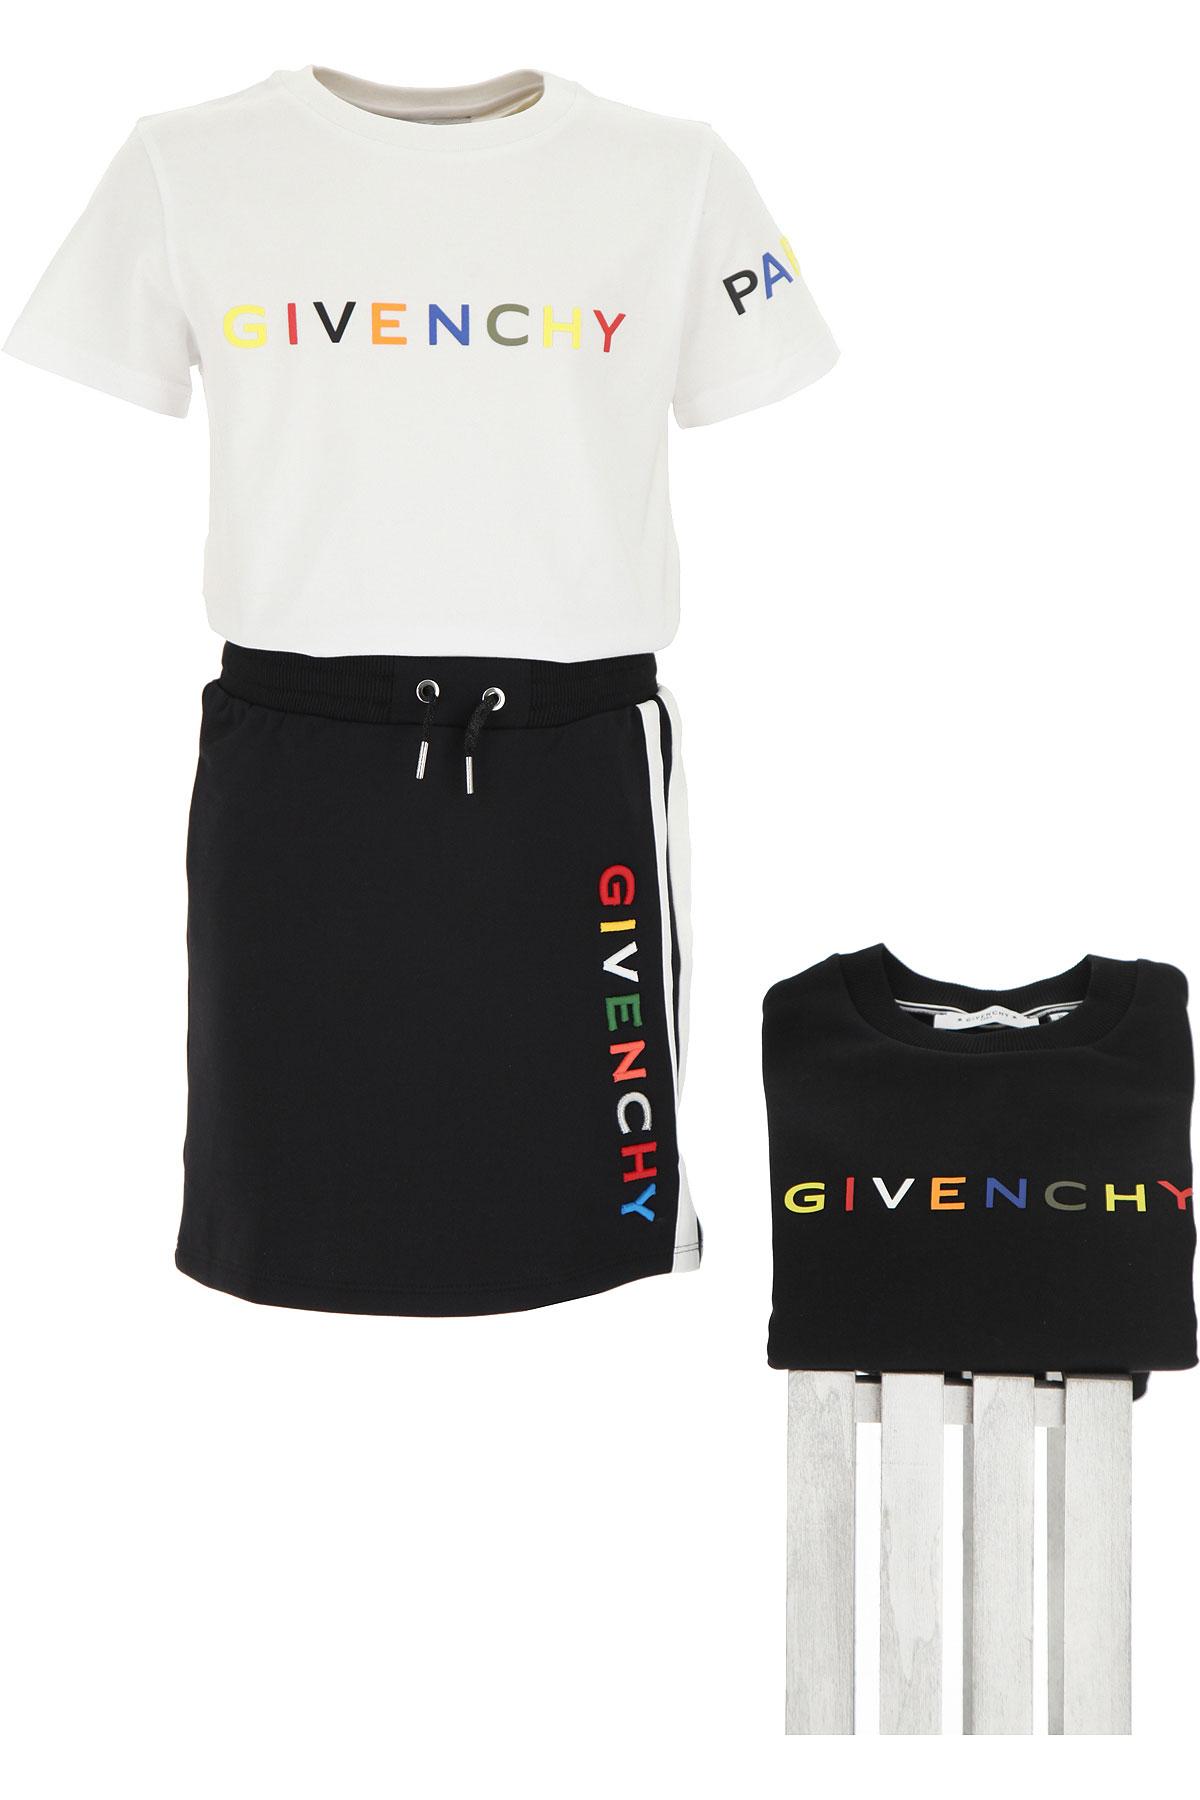 givenchy clothing